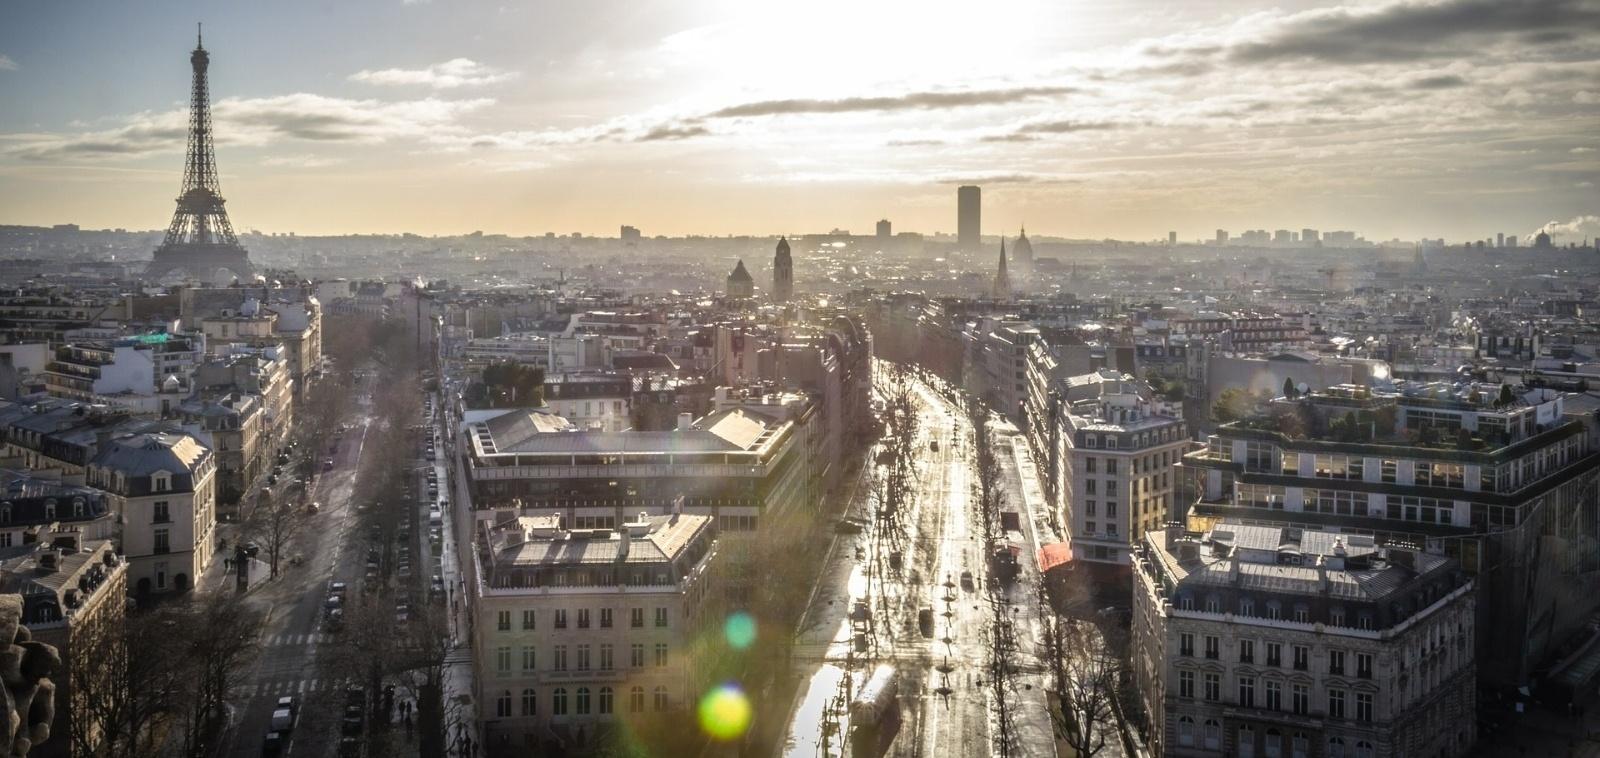 paris-415476_1920-966119-edited-060818-edited.jpg